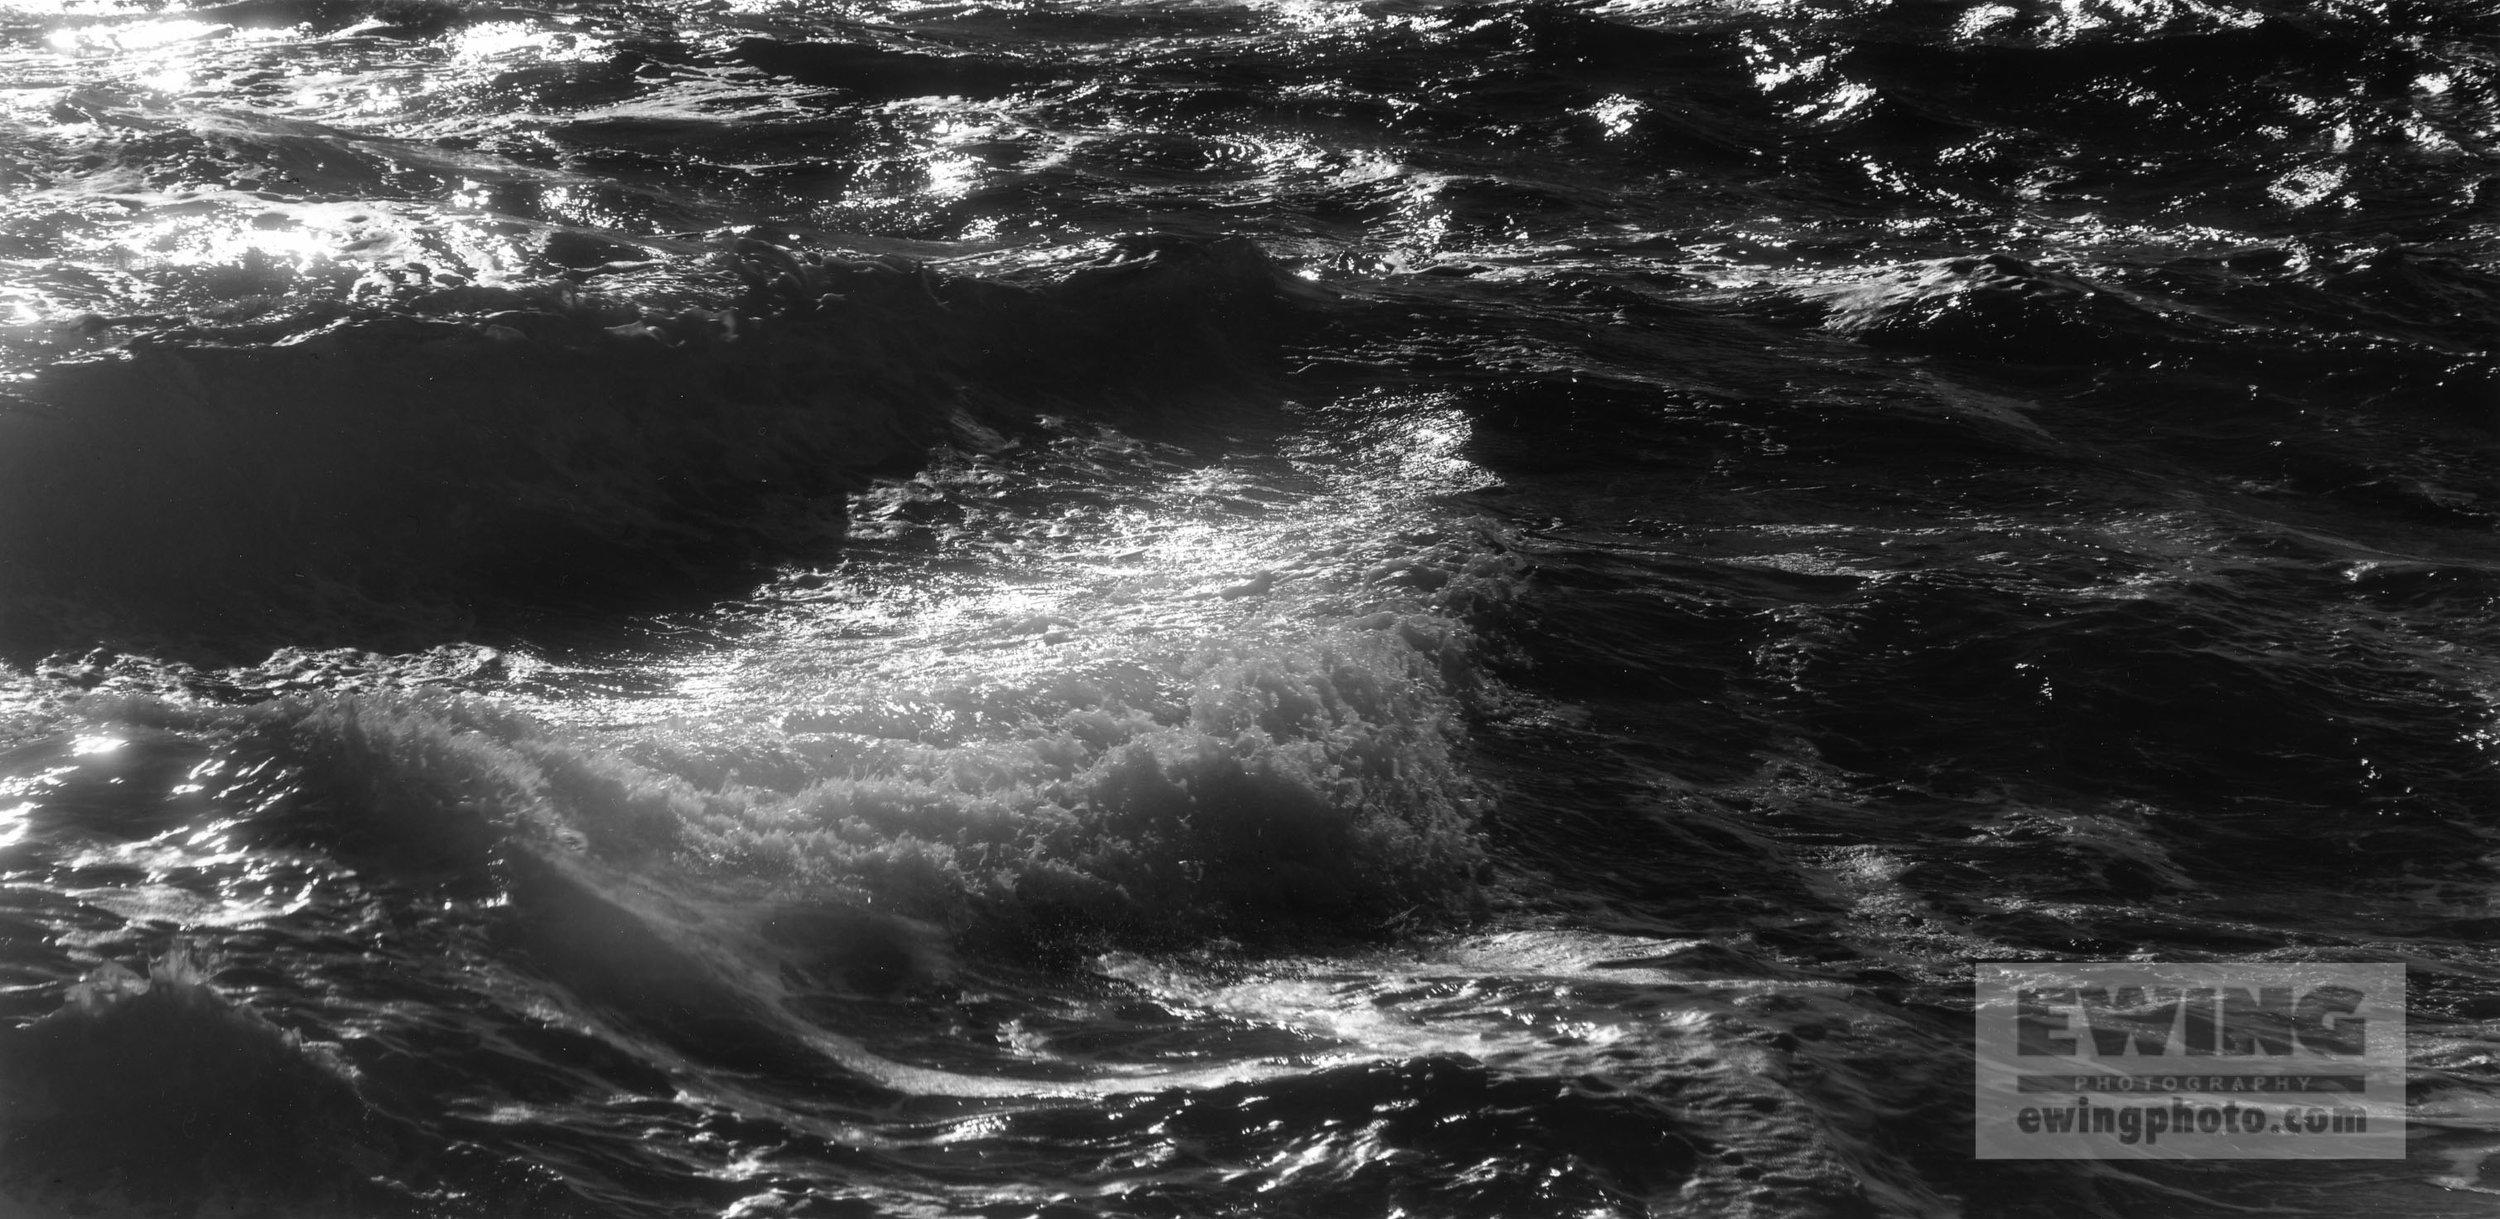 WAVE #2